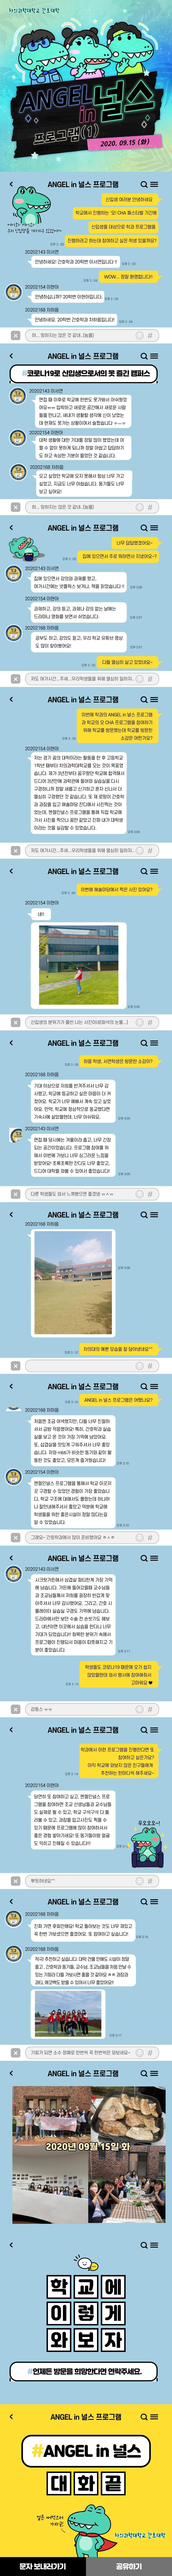 ANGEL-in-널스-인터뷰-카드-뉴스.jpg